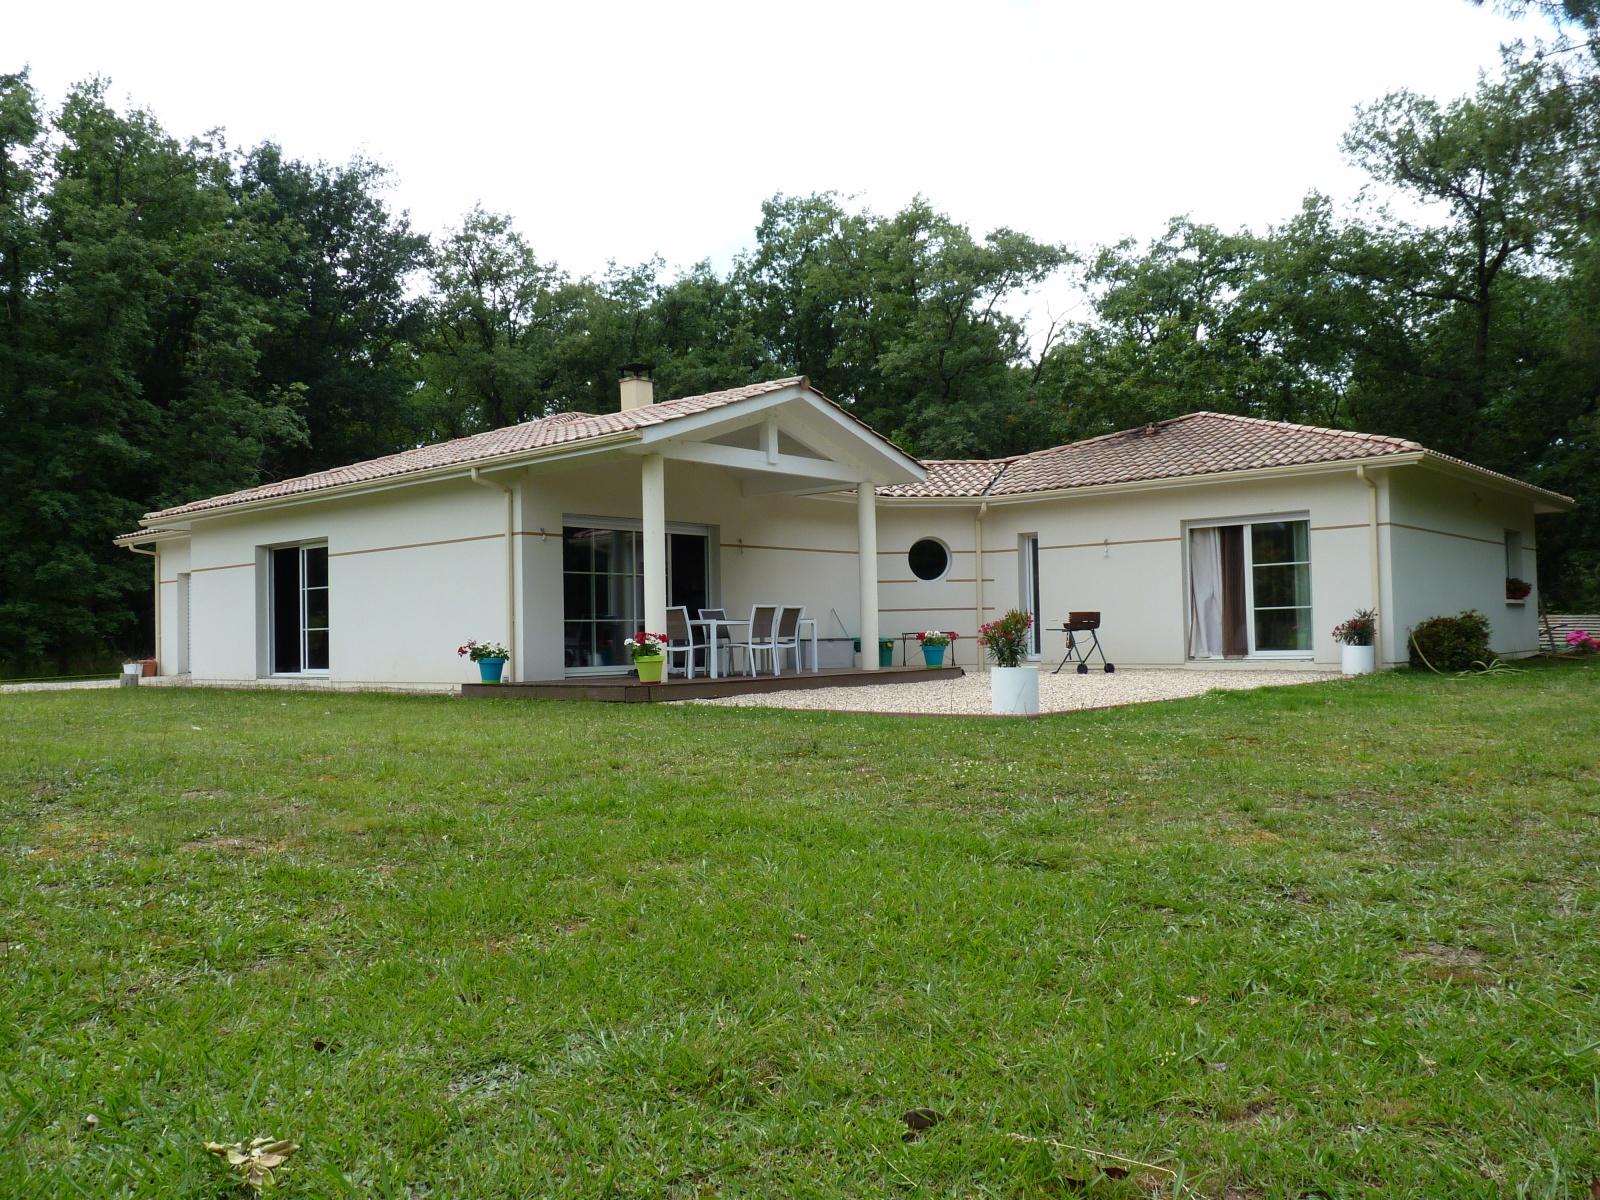 Annonce vente maison moulin neuf 24700 174 m 265 174 for Vente maison neuf